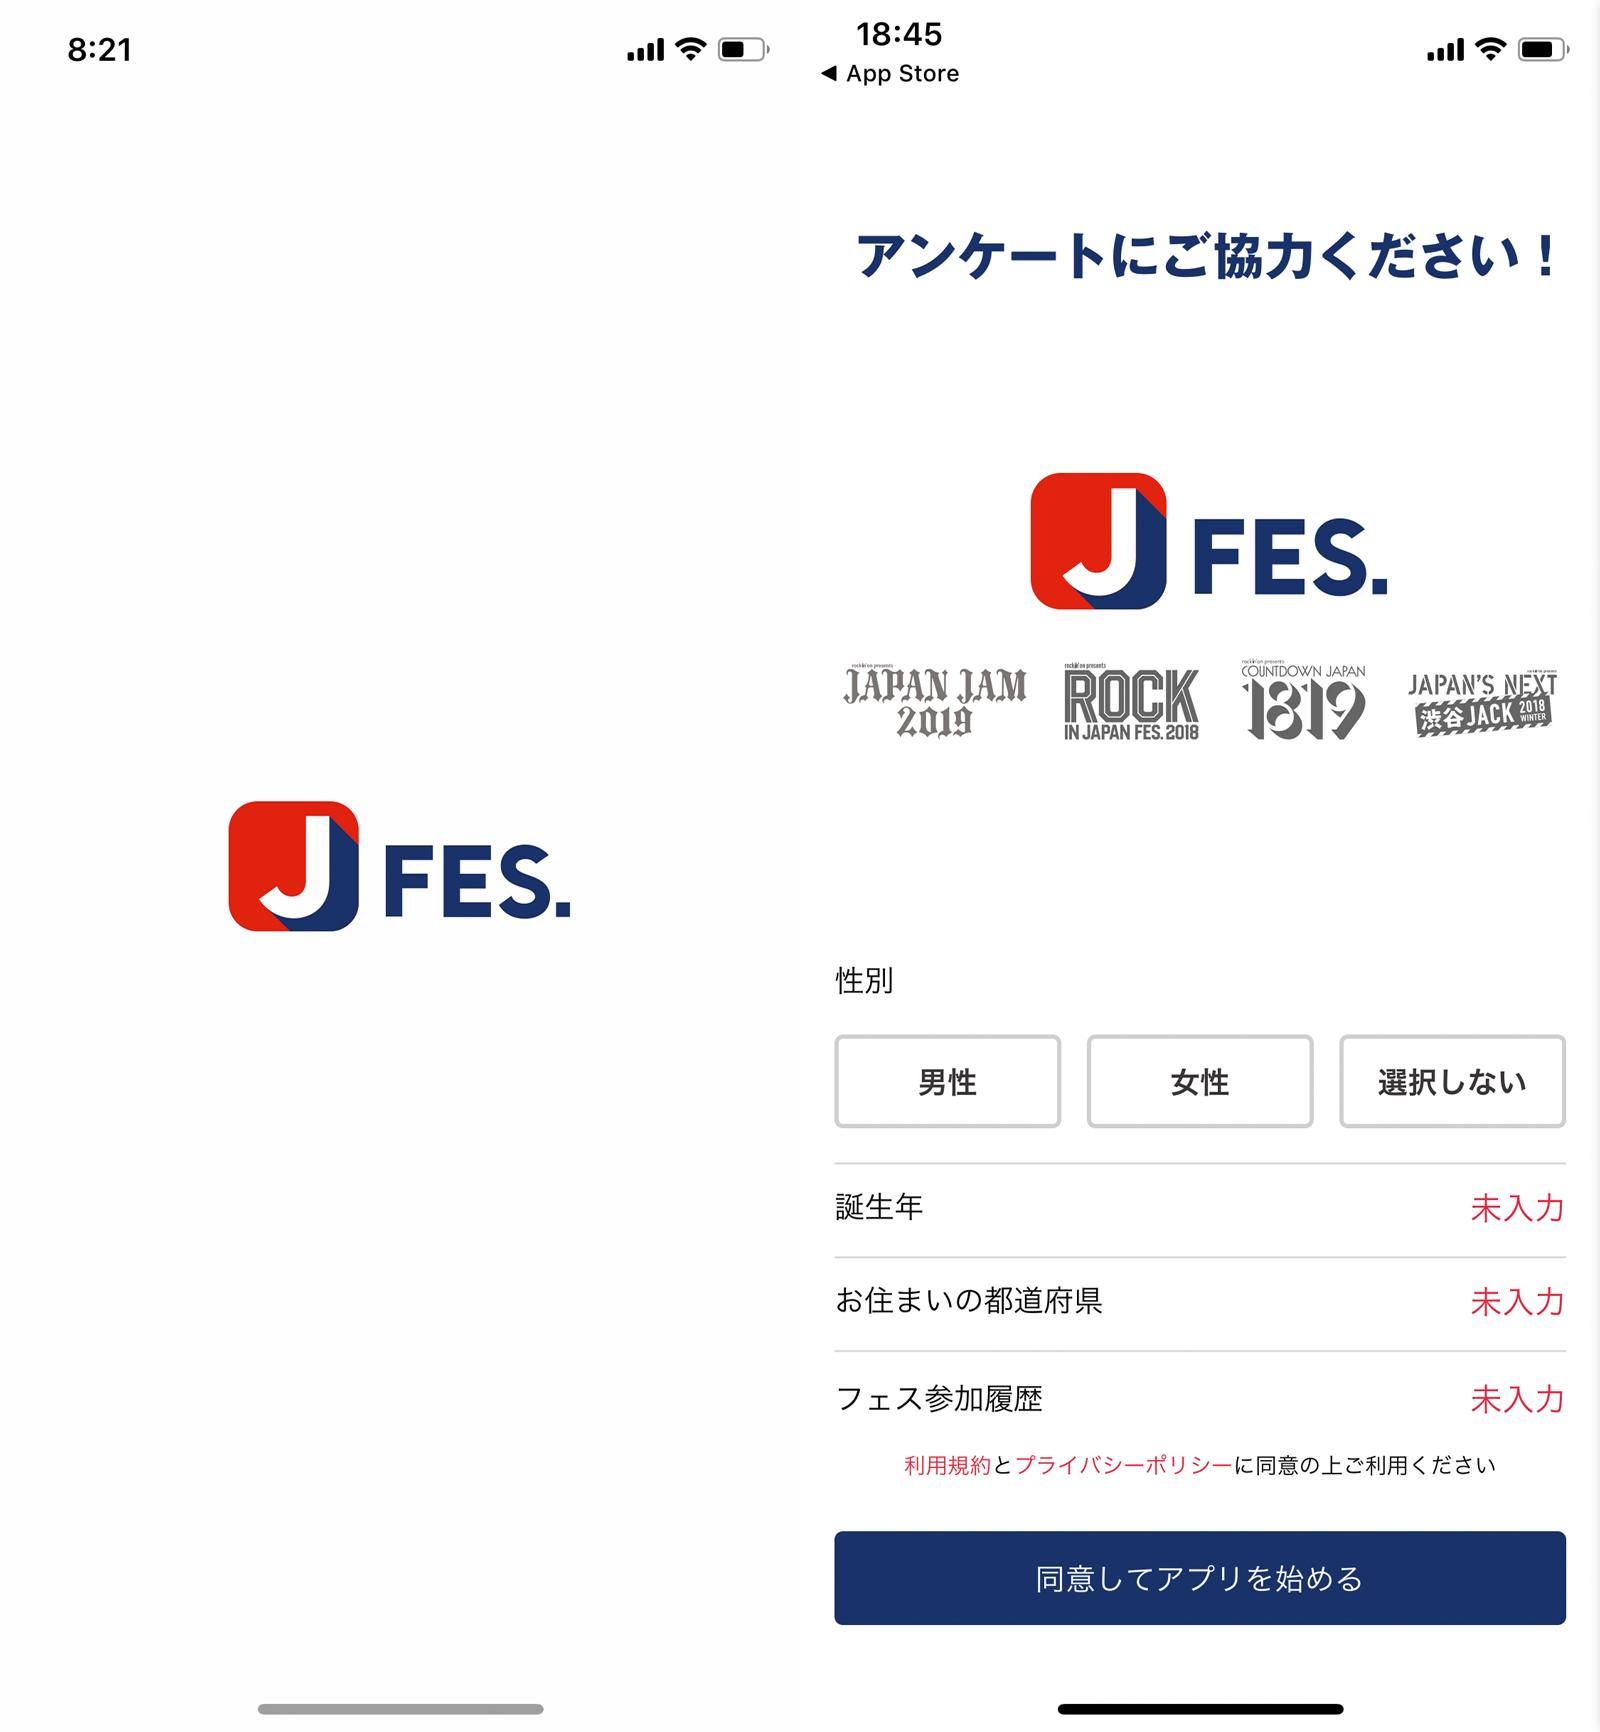 Jフェスアプリを起動して、アンケートに回答